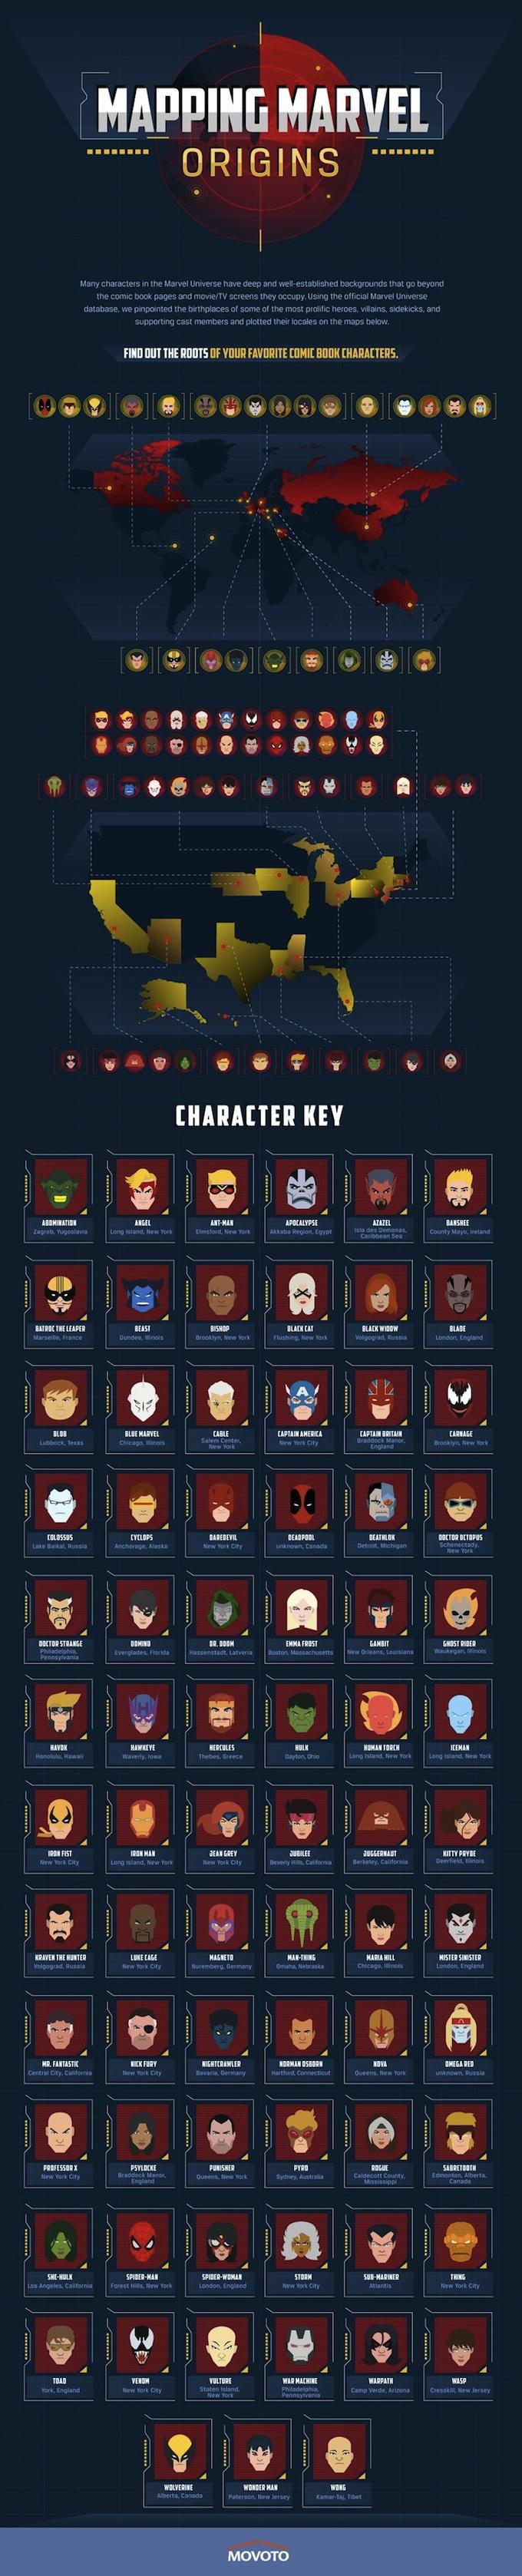 complete list of marvel character origins | comics | pinterest